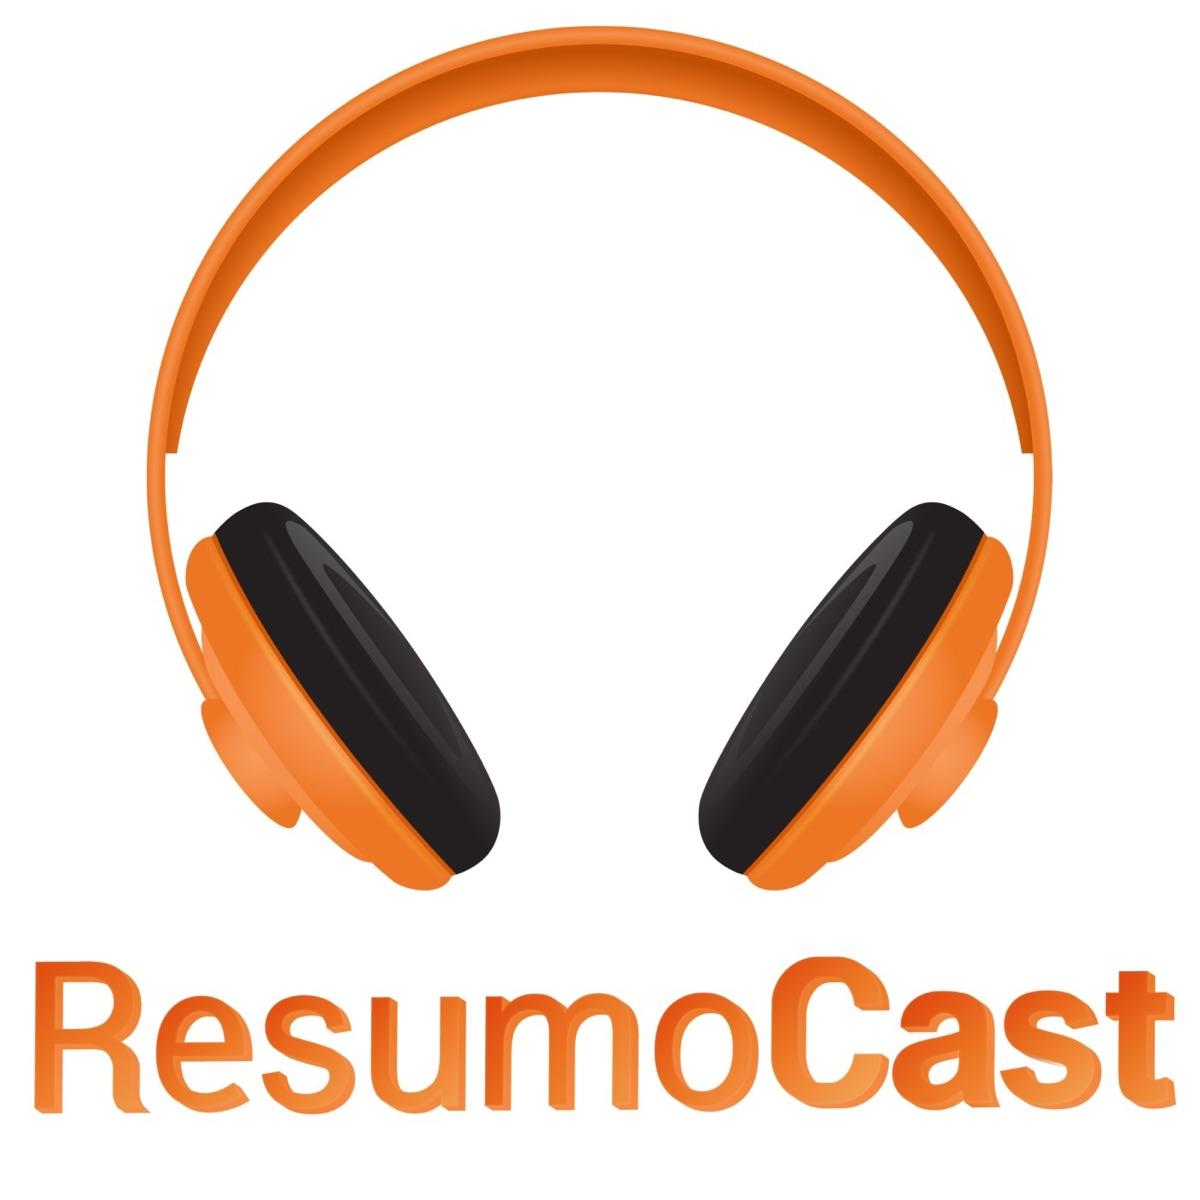 Resumocast